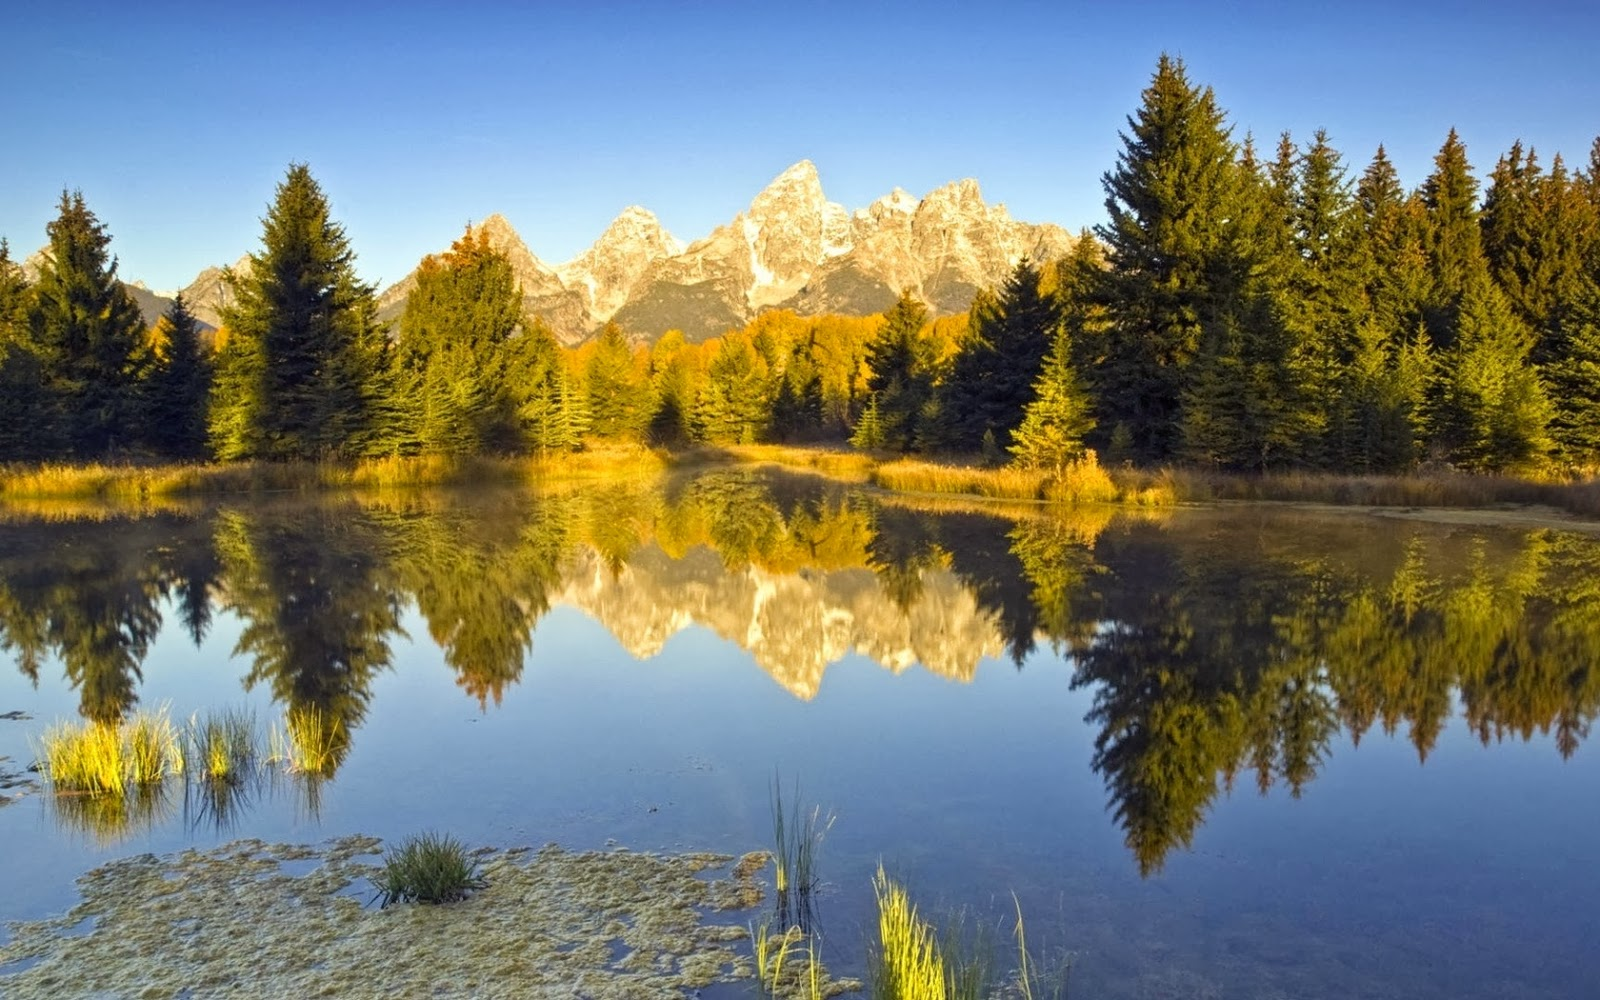 fotos de paisajes originales